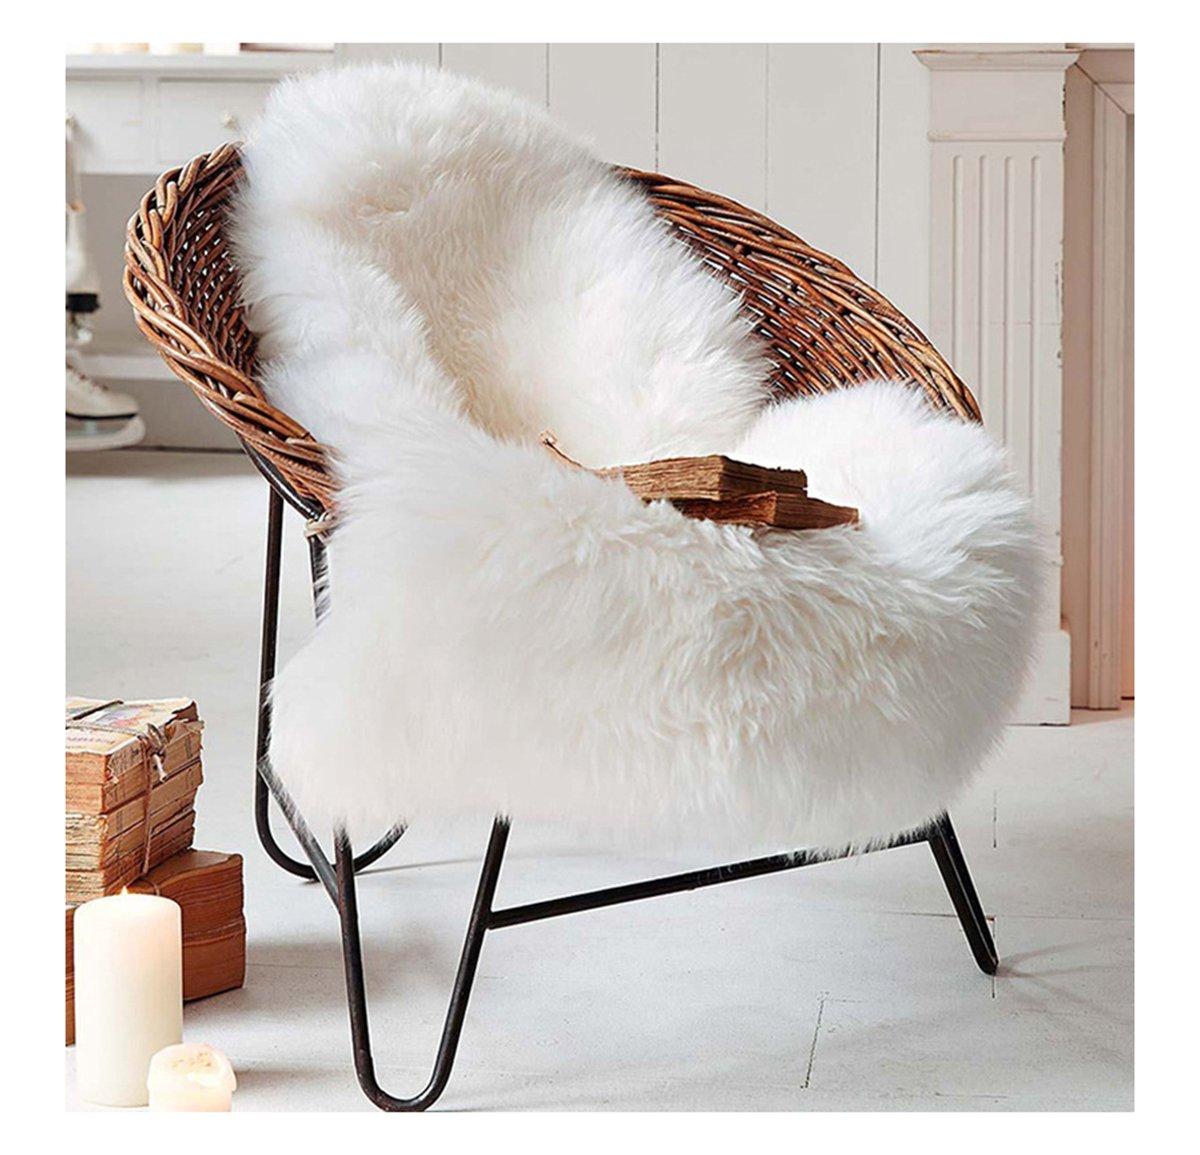 Ultra Soft Faux Sheepskin Fur Rug Environmental Nursery Lambskin Area Shag Baby Chair Cover Seat Pad 28'' x 45''